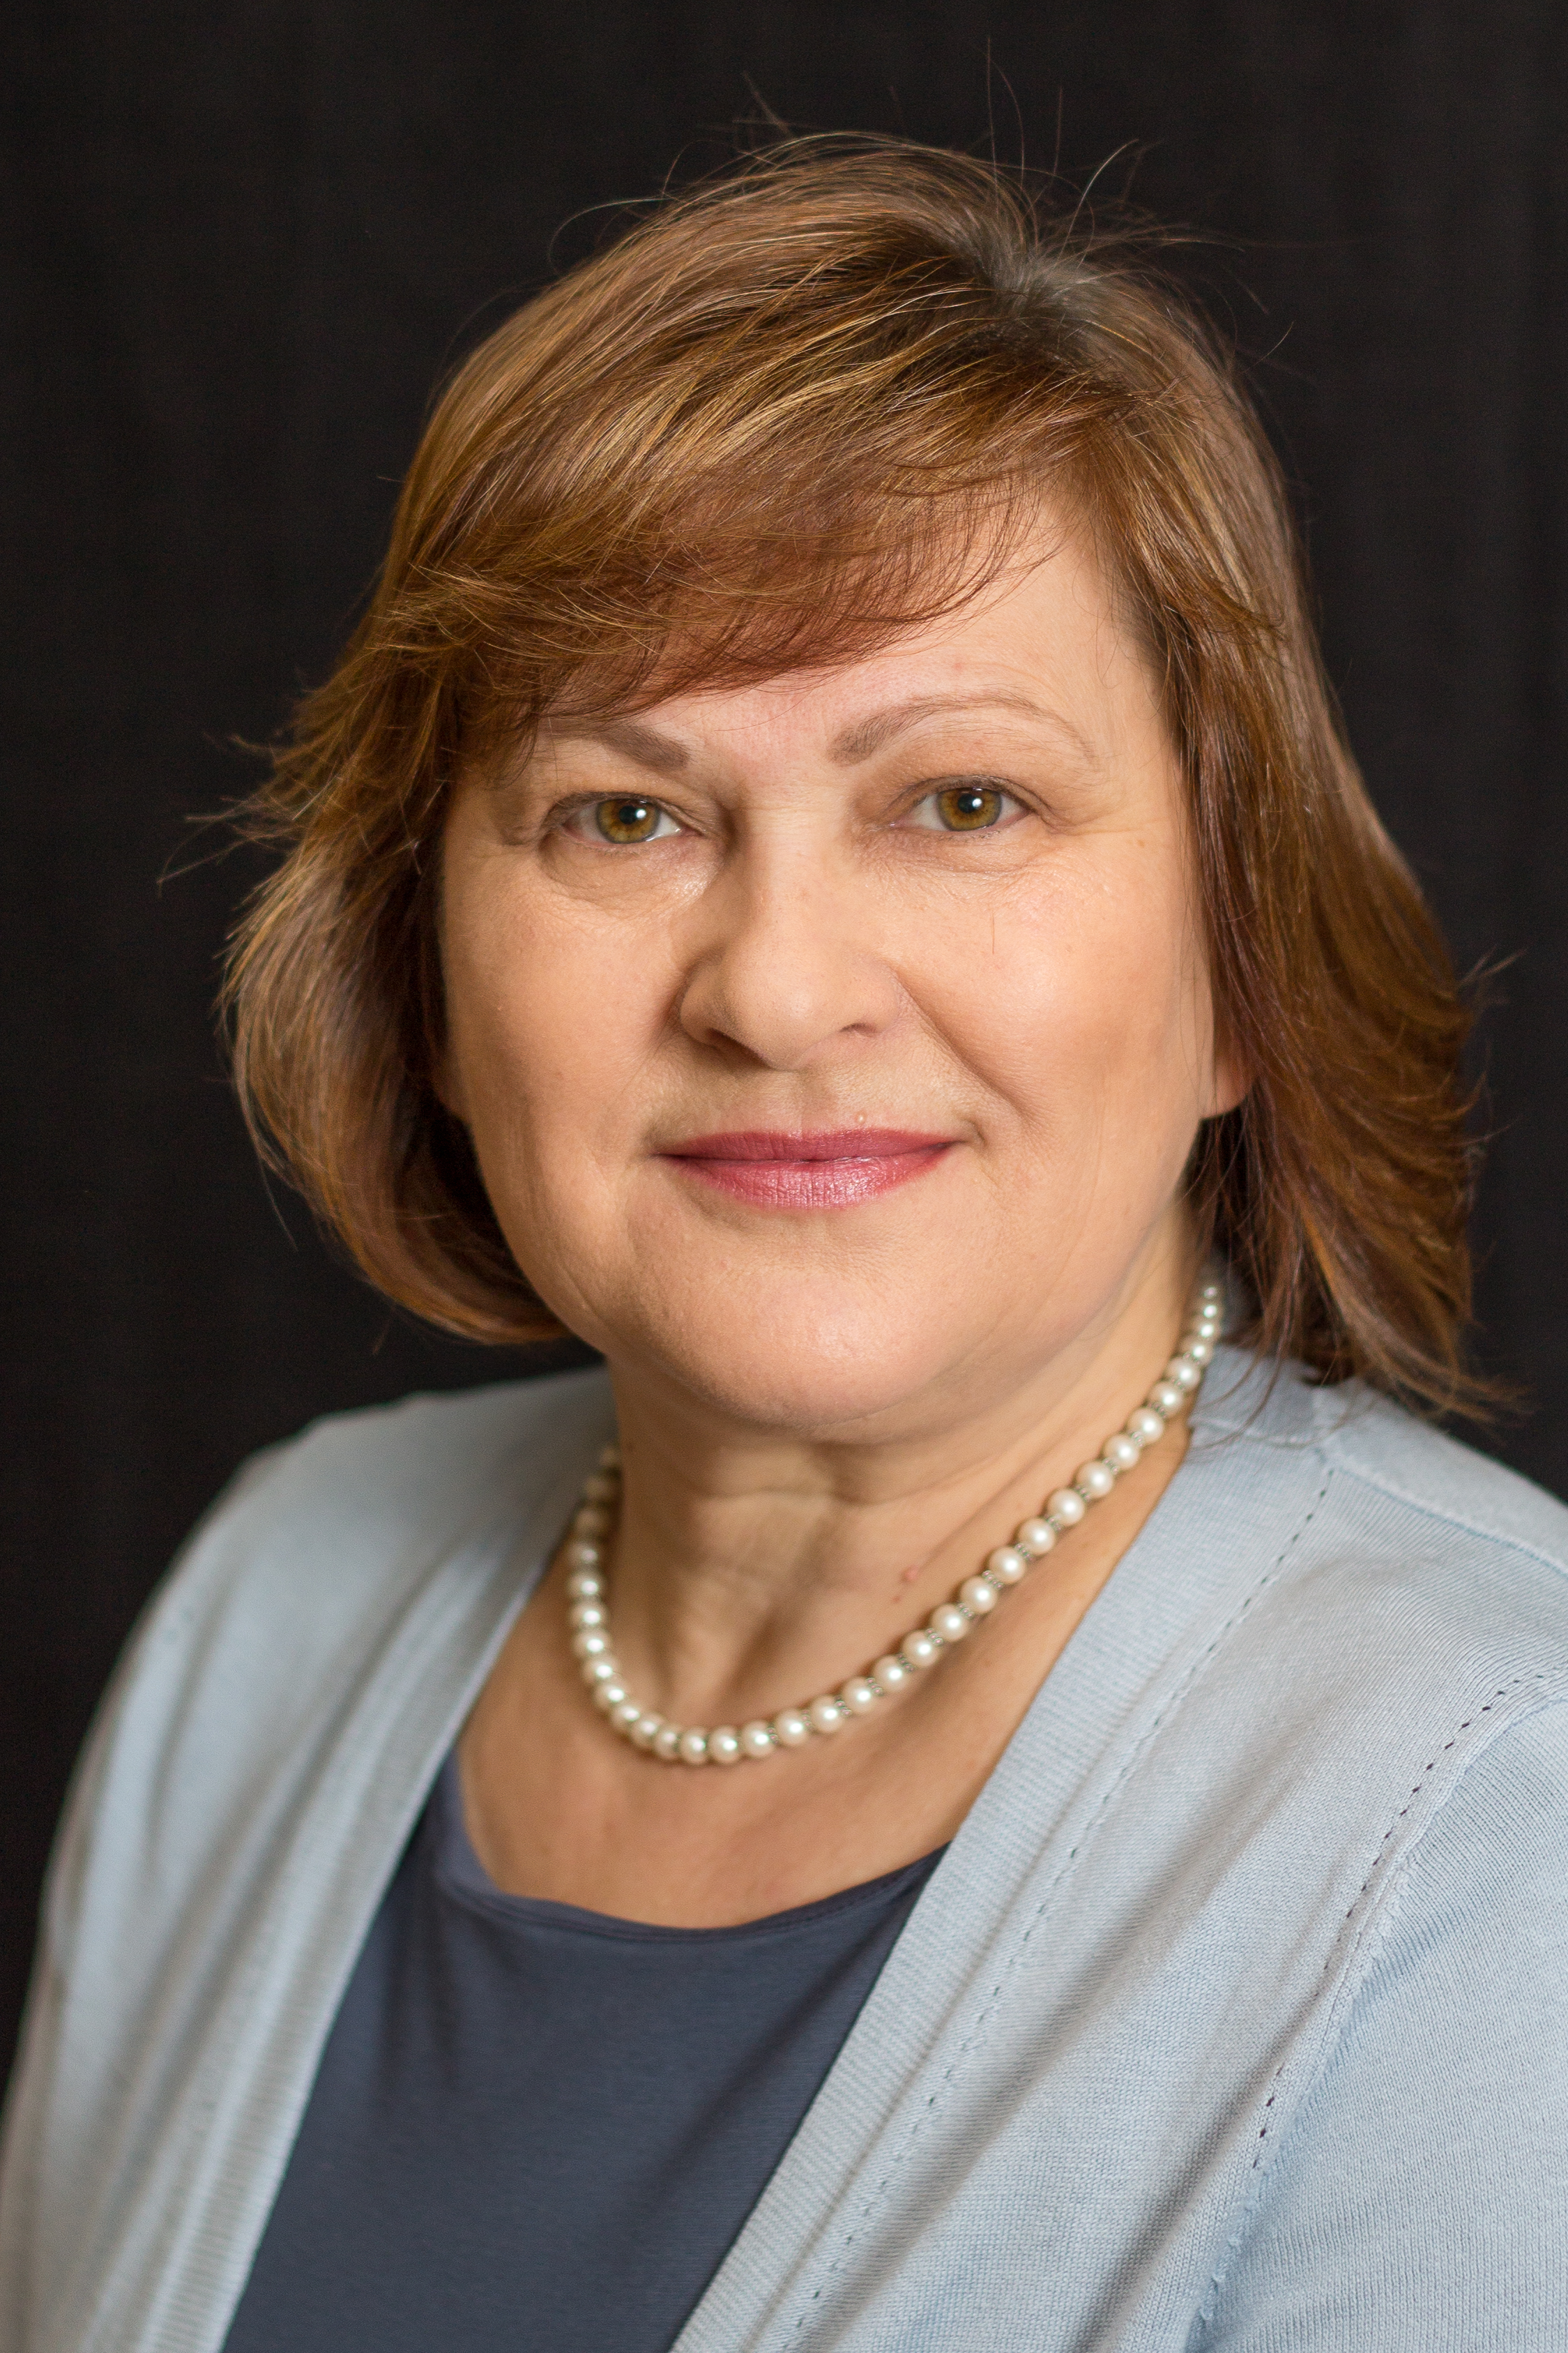 Irina Weisblat-9795.JPG